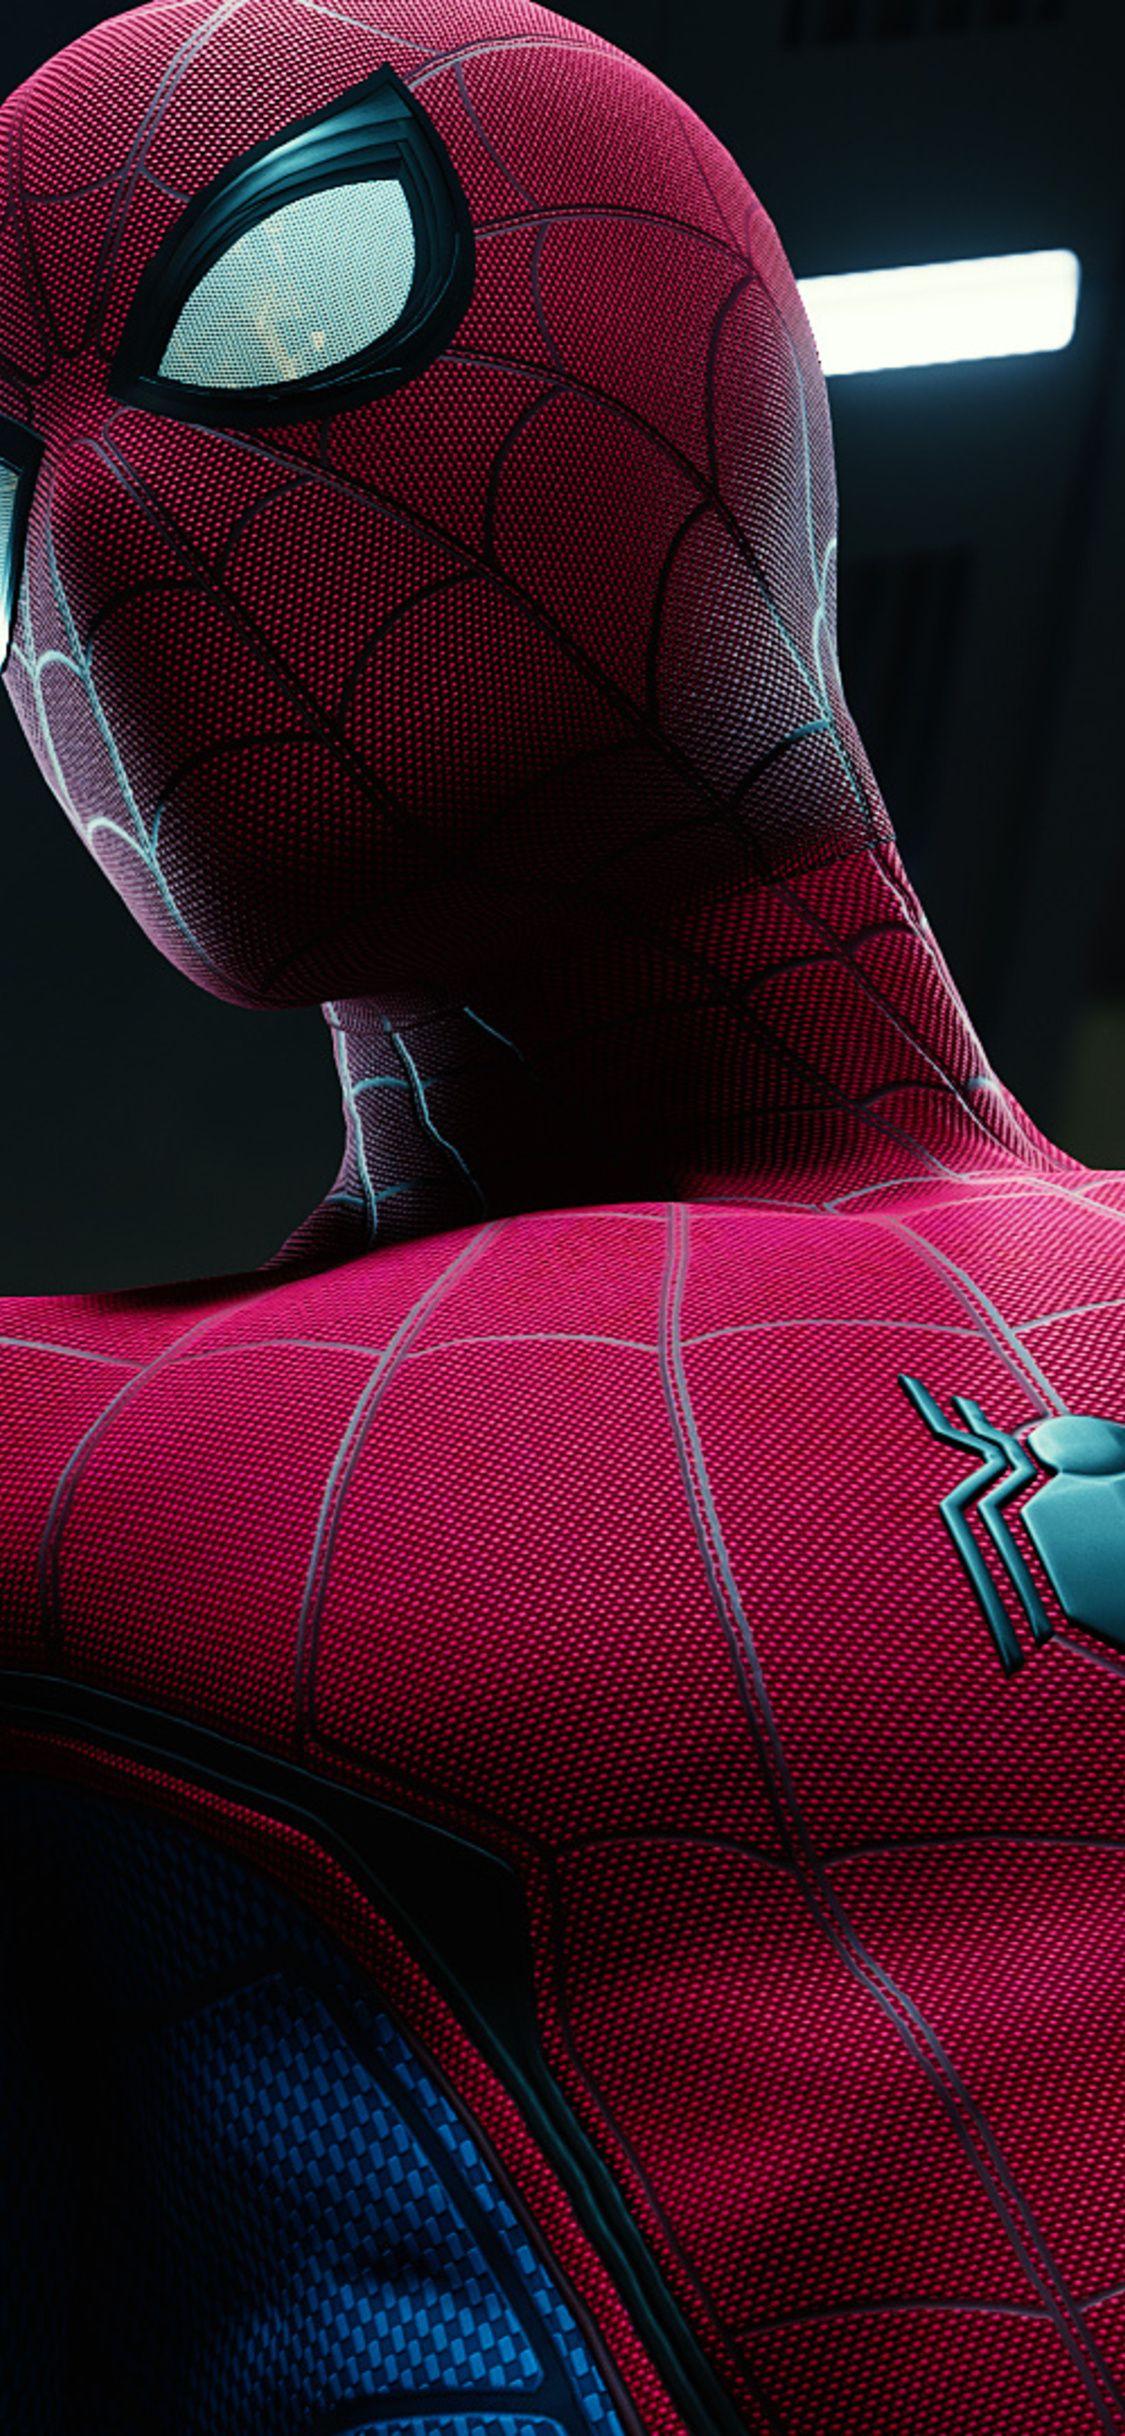 Spiderman HD 2018 In 1125x2436 Resolution in 2020